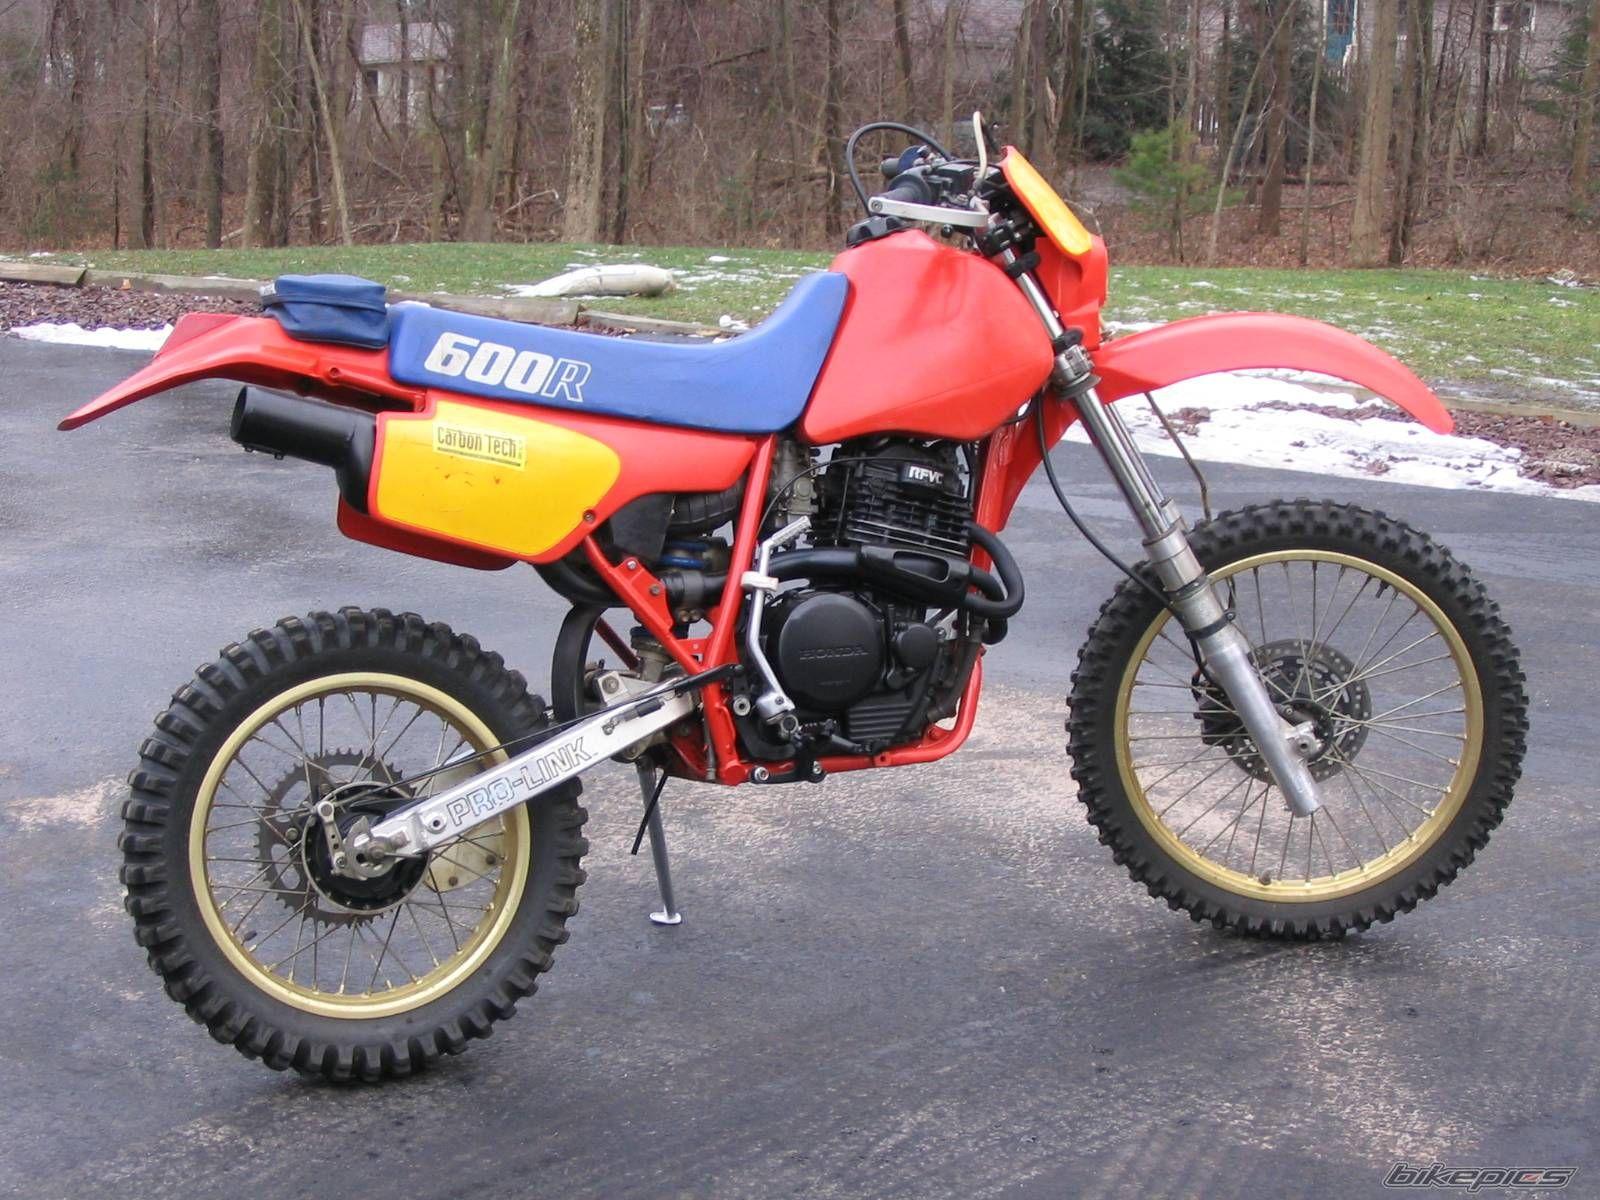 86 honda 600 xl my bikes motorcycle motorcycle gear. Black Bedroom Furniture Sets. Home Design Ideas